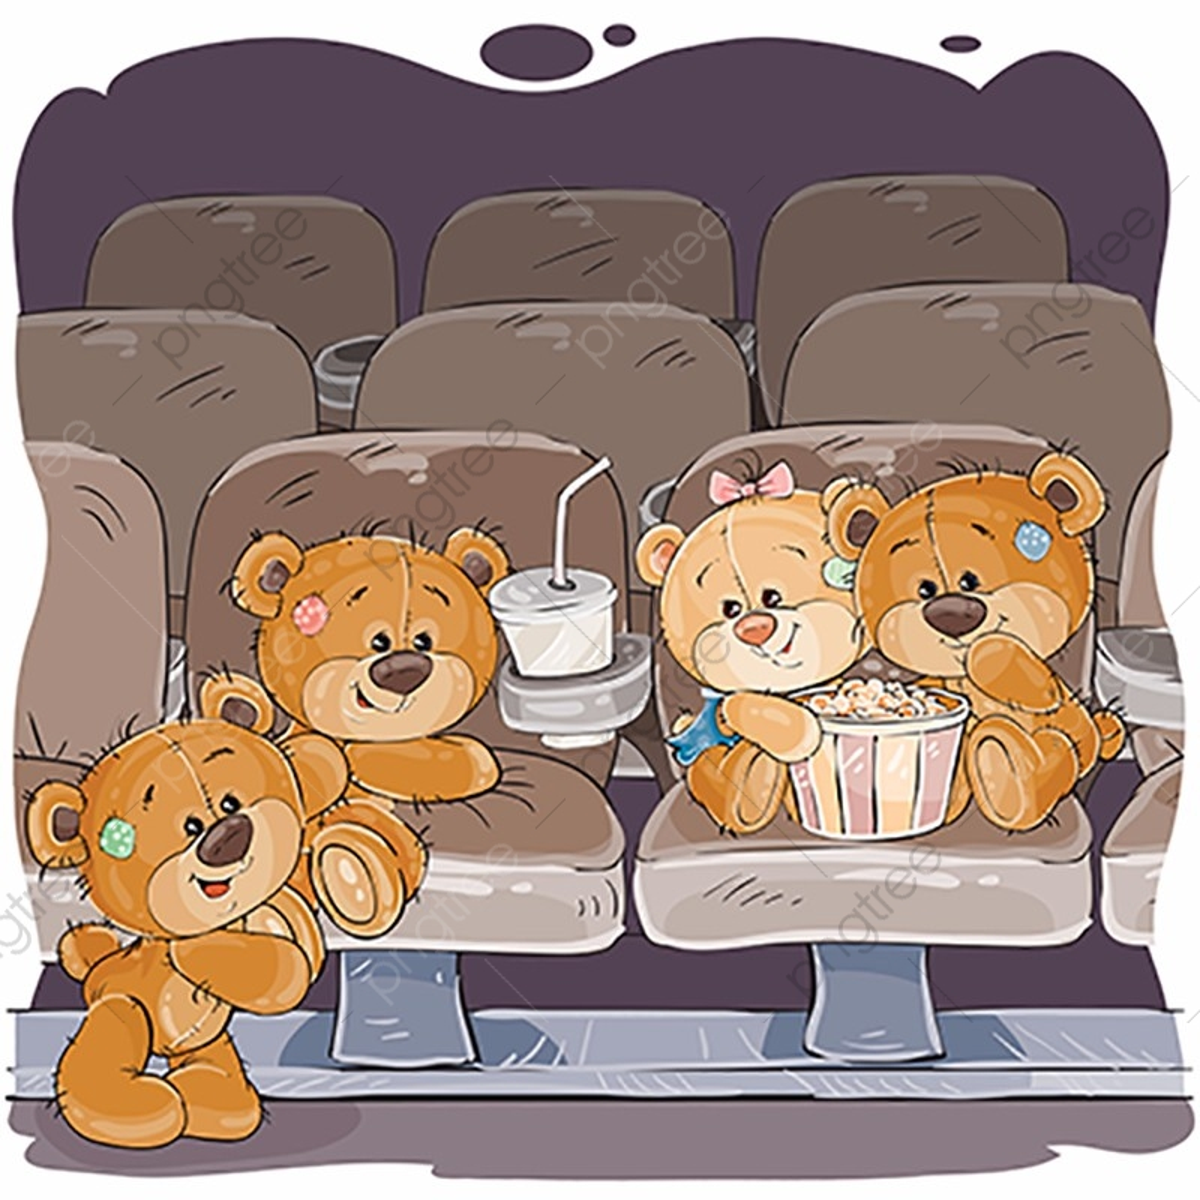 медвежонок смотрит телевизор картинки процессе игры ребенок